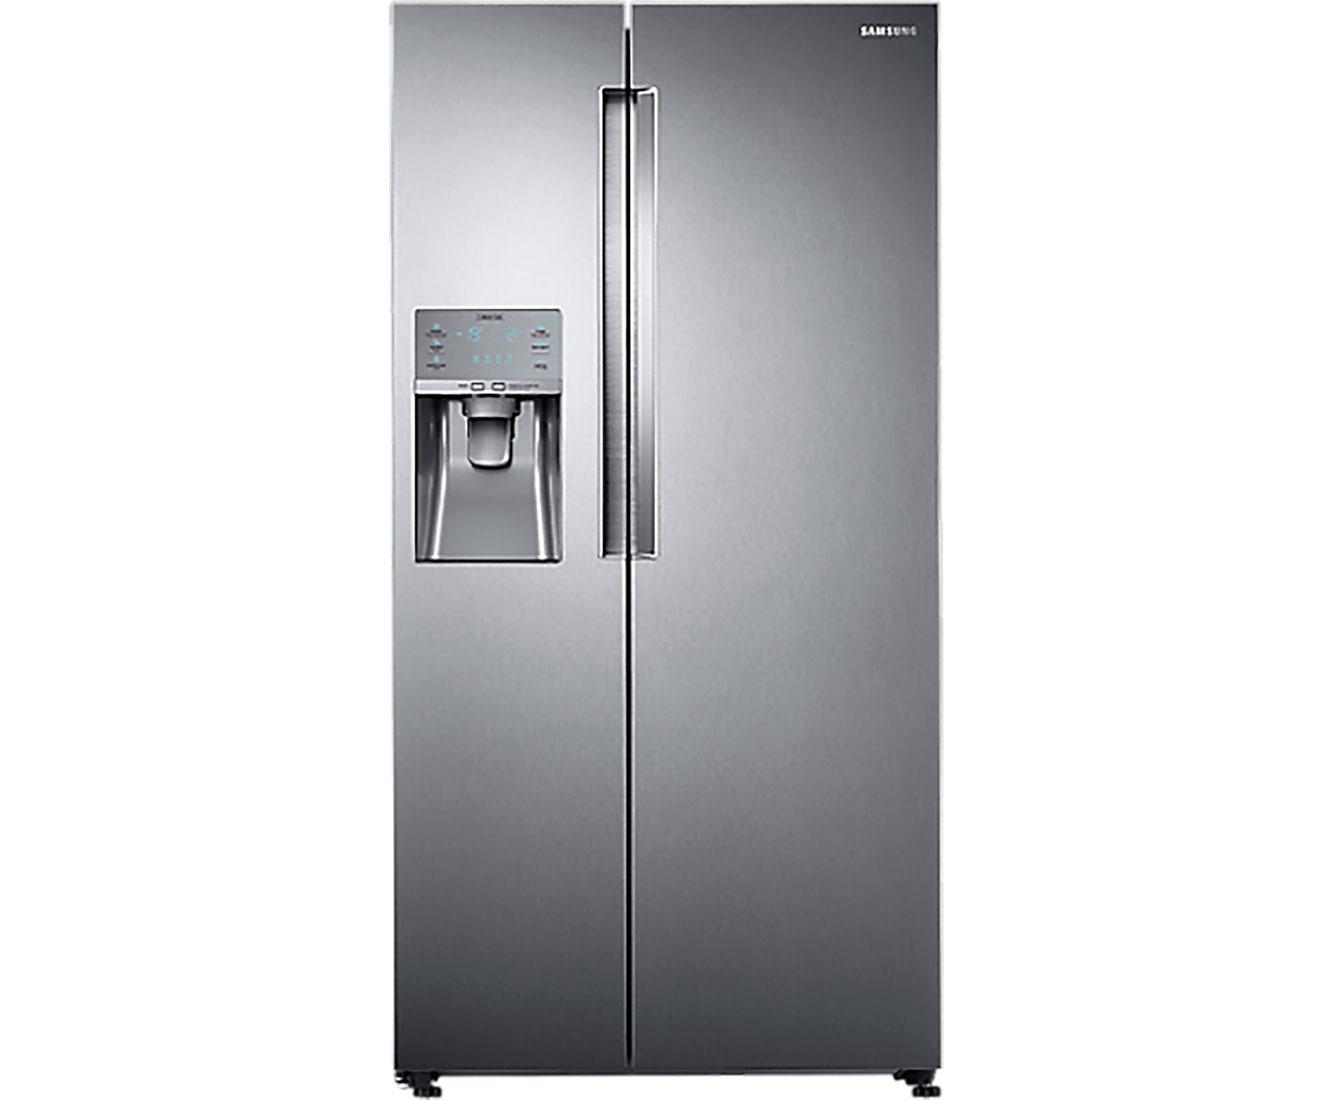 Amica Kühlschrank Expert : Amica kühlschrank expert: rabatt preisvergleich.de kühlen